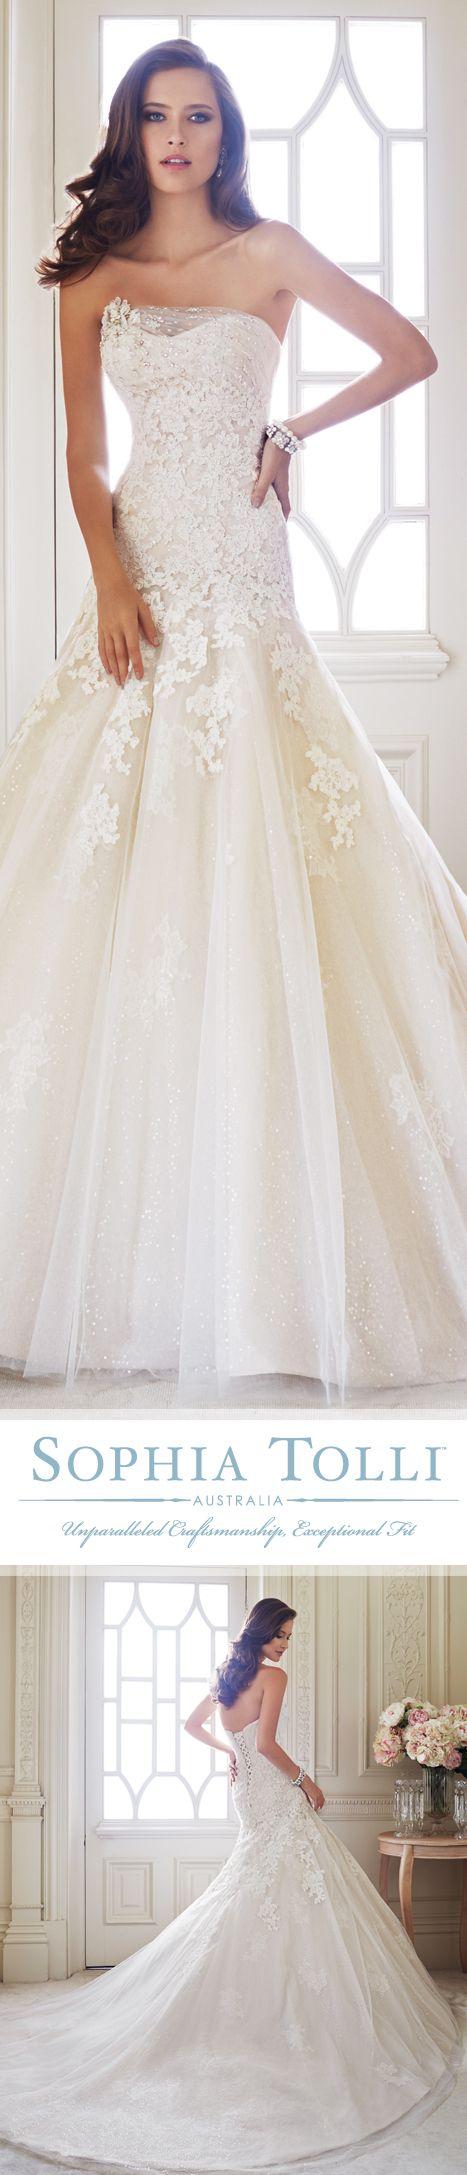 Best wedding dresses of 2014 wedding dresses 2014 for Wedding dresses no train